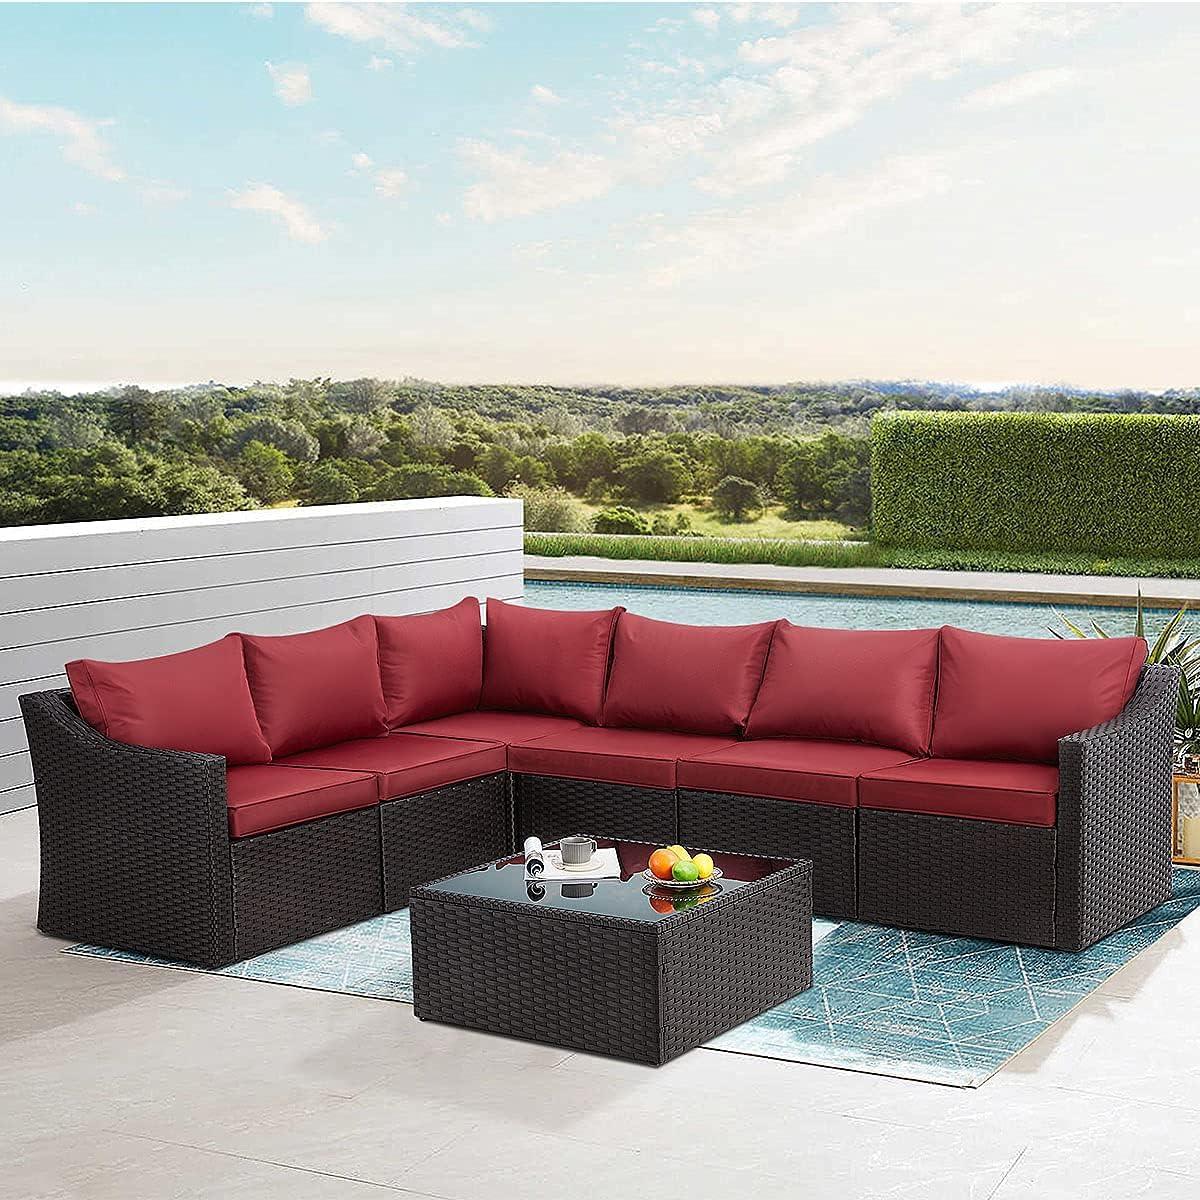 EROMMY 7 Pieces Outdoor Patio Furniture PE 予約 品質検査済 Rattan Set Sectional